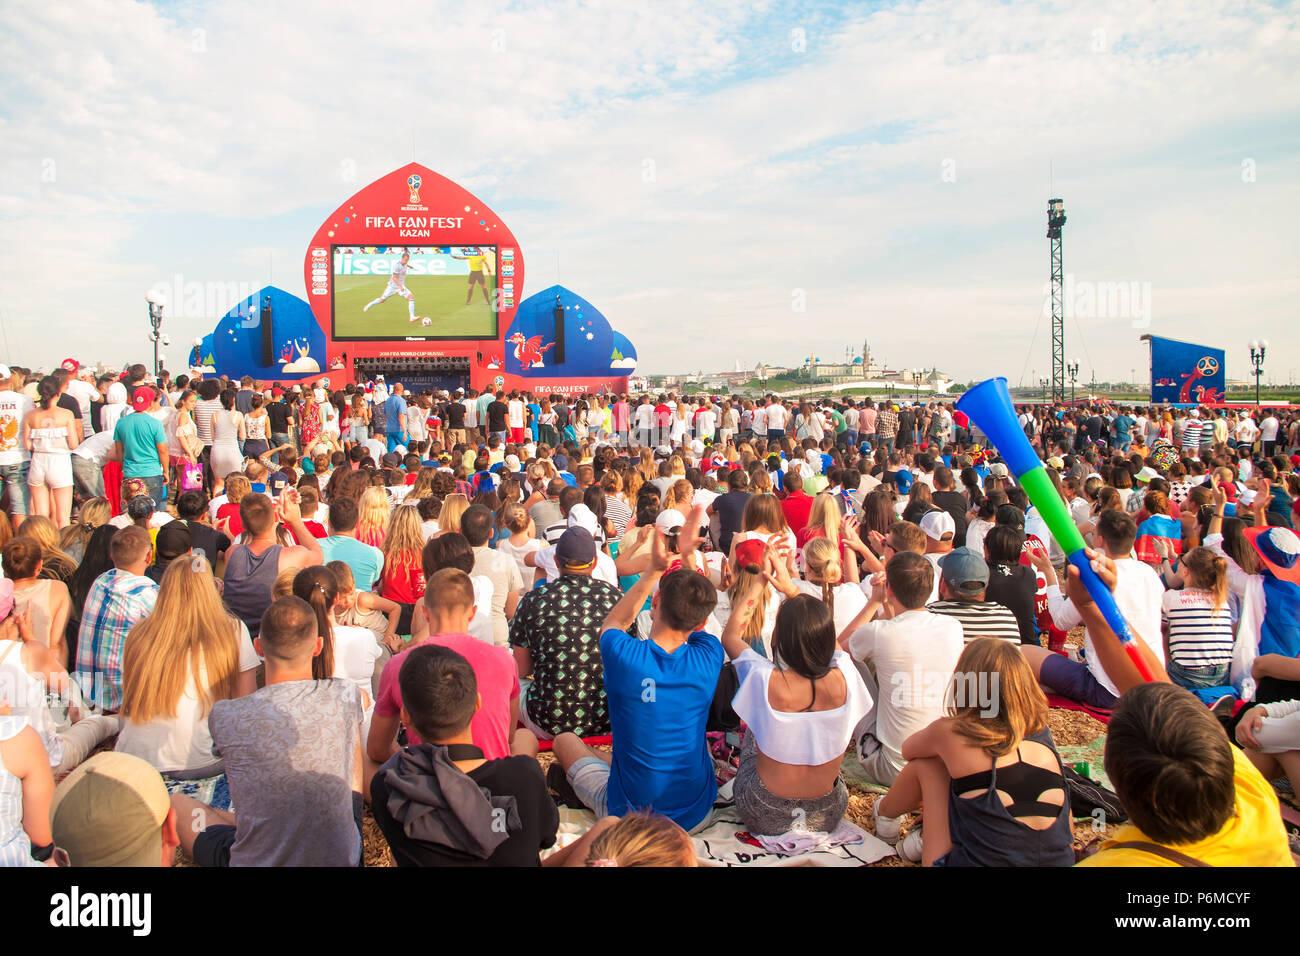 KAZAN, RUSSIA - 1 JULY, 2018: Russia football fans cheering at Kazan Fan Fest Zone as Artem Dzyuba runs with the football on screen during Spain vs Russia match. Credit: Aygul Sarvarova/Alamy Live News Stock Photo